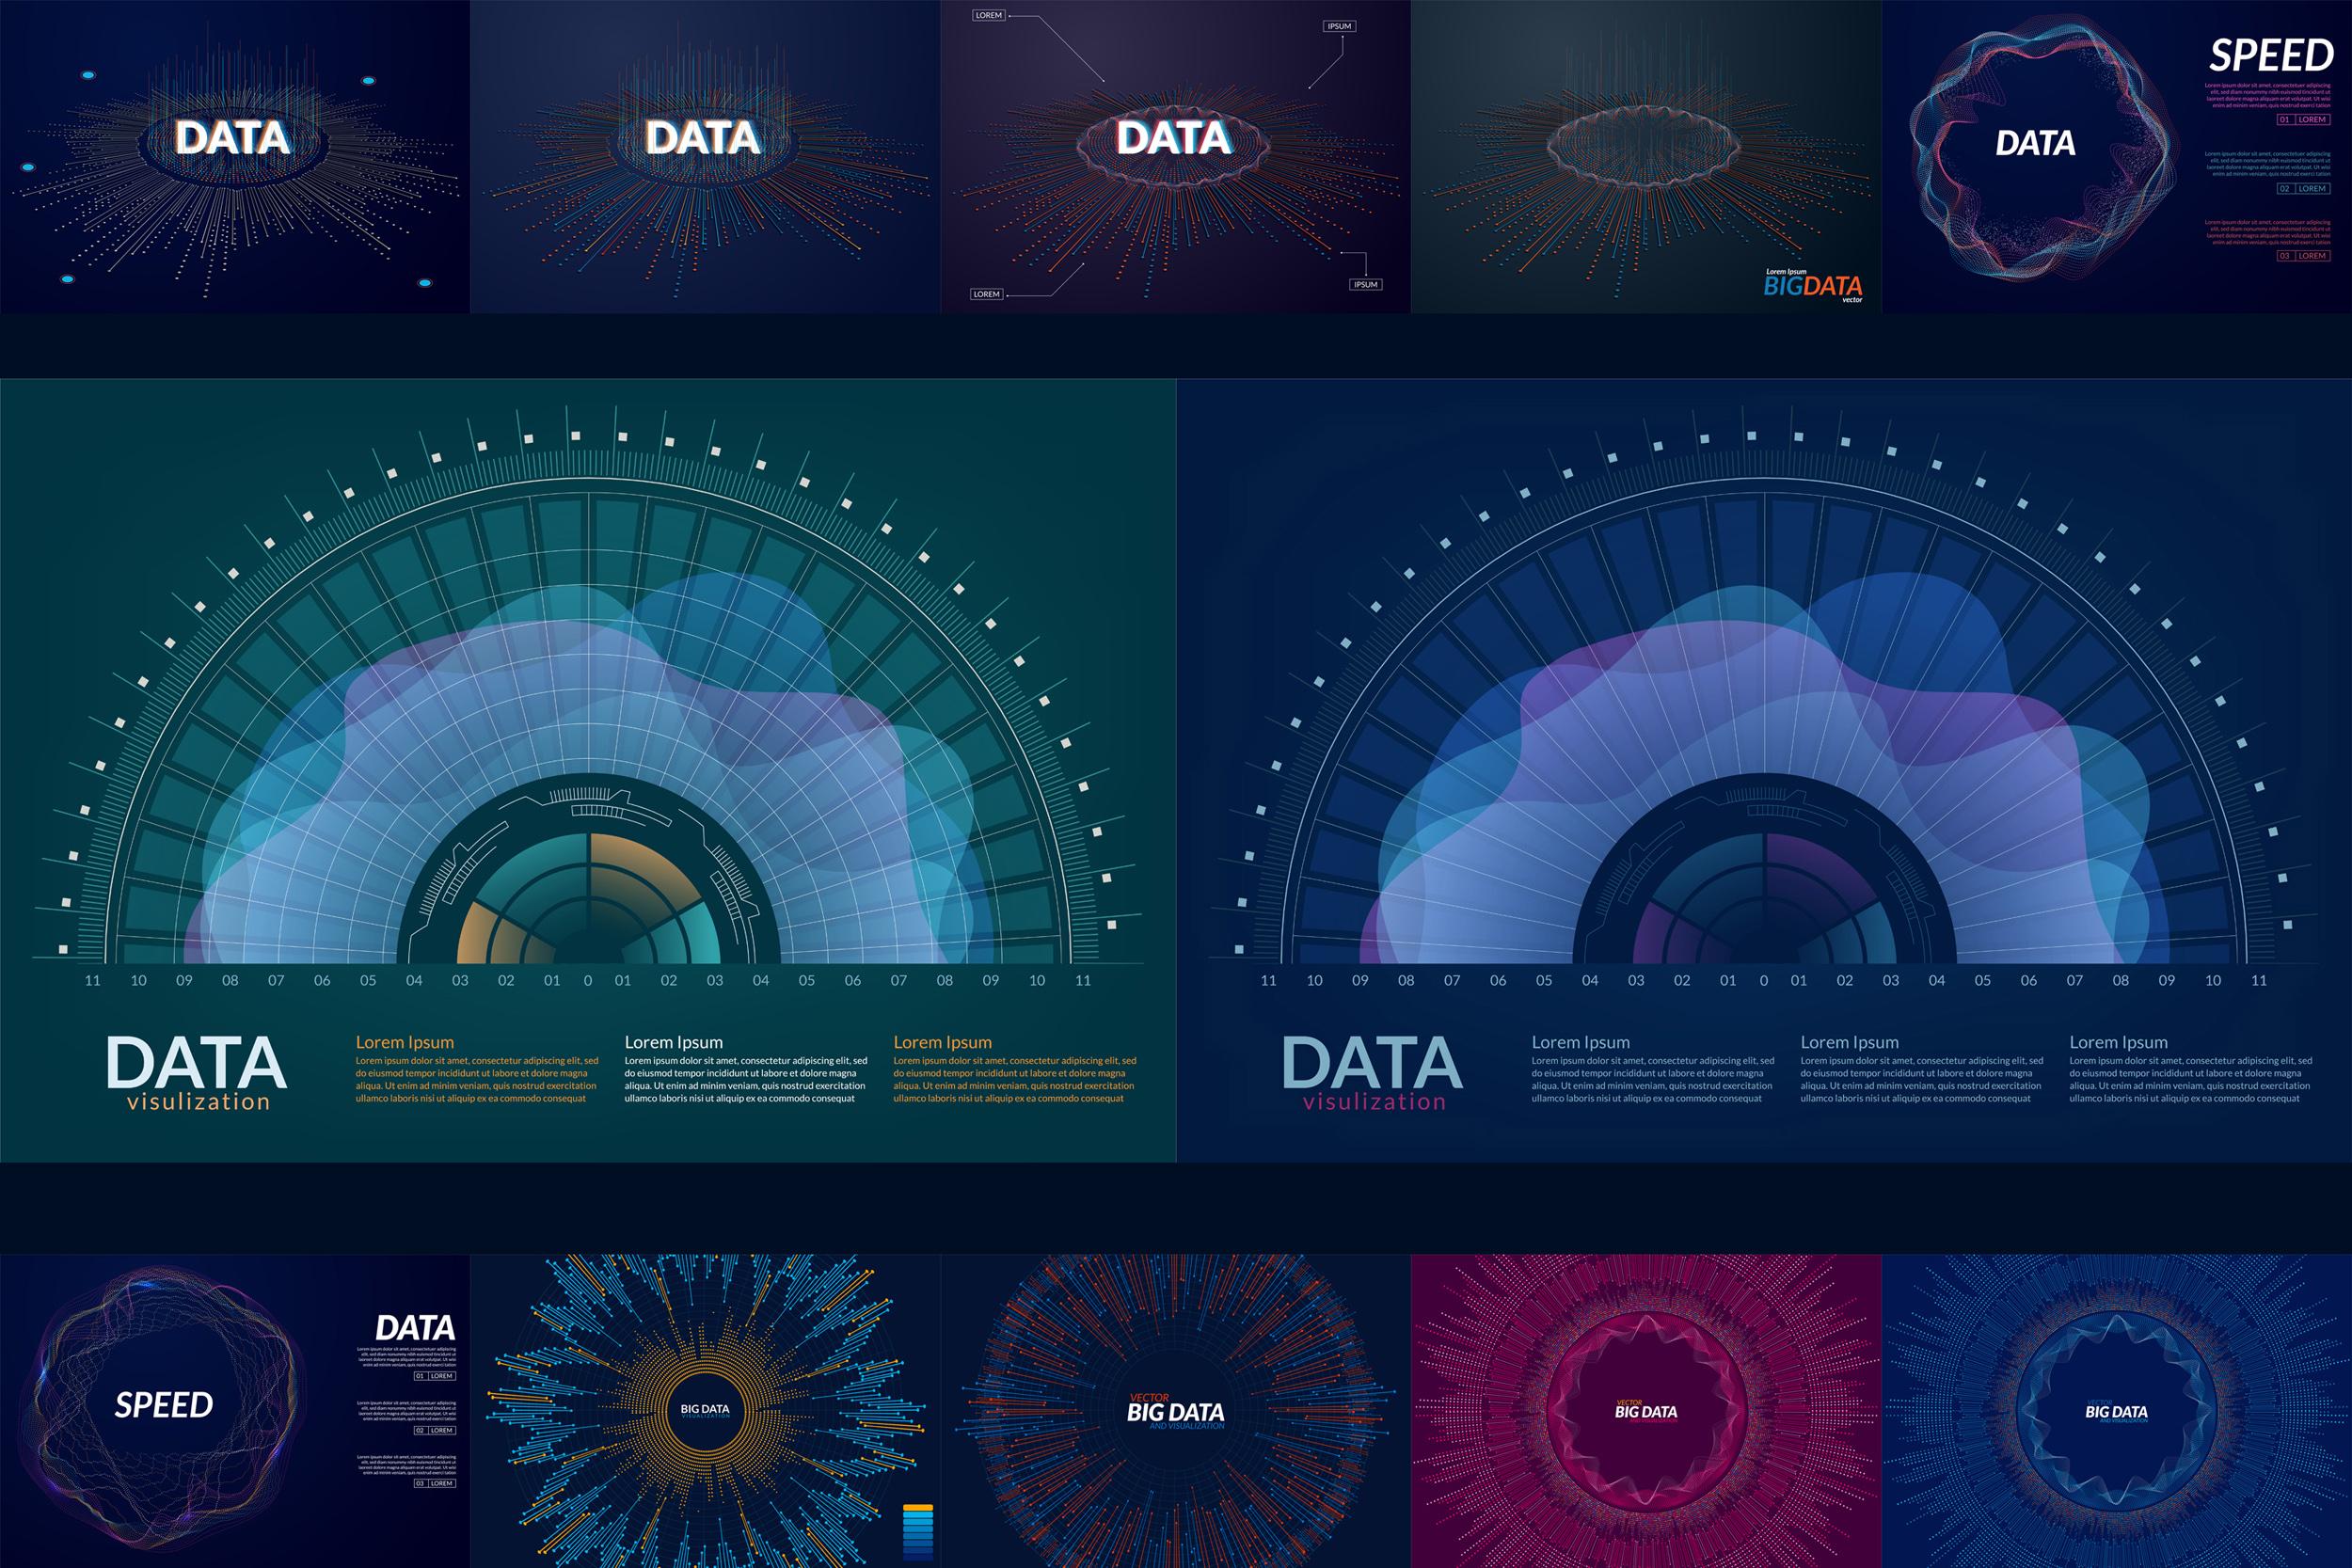 Big Data Backgrounds example image 2